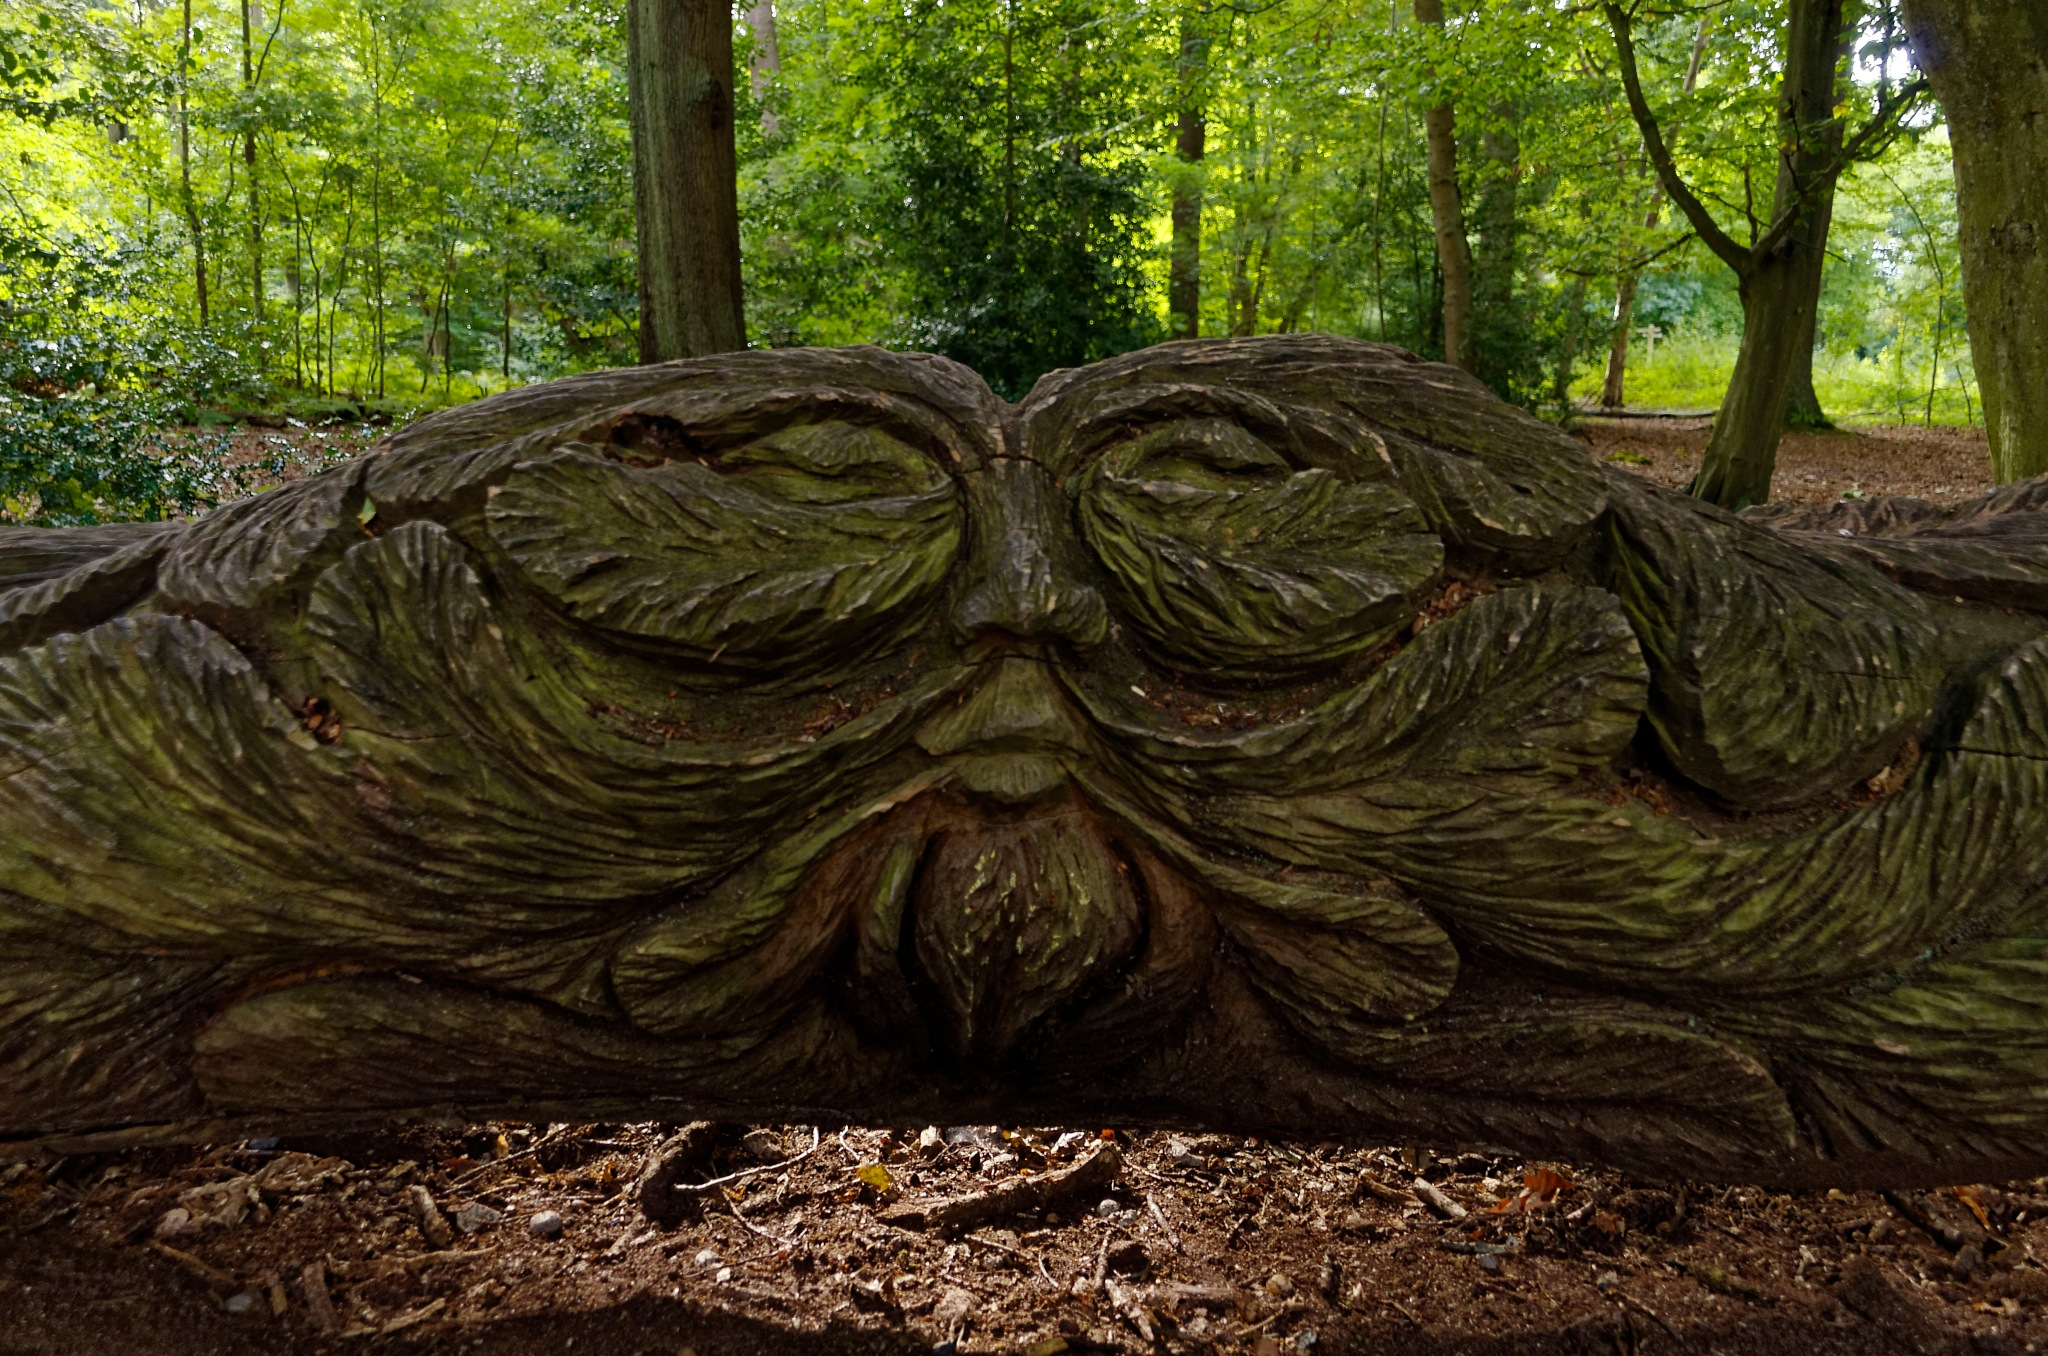 chainsaw art by paulrobin.andrews